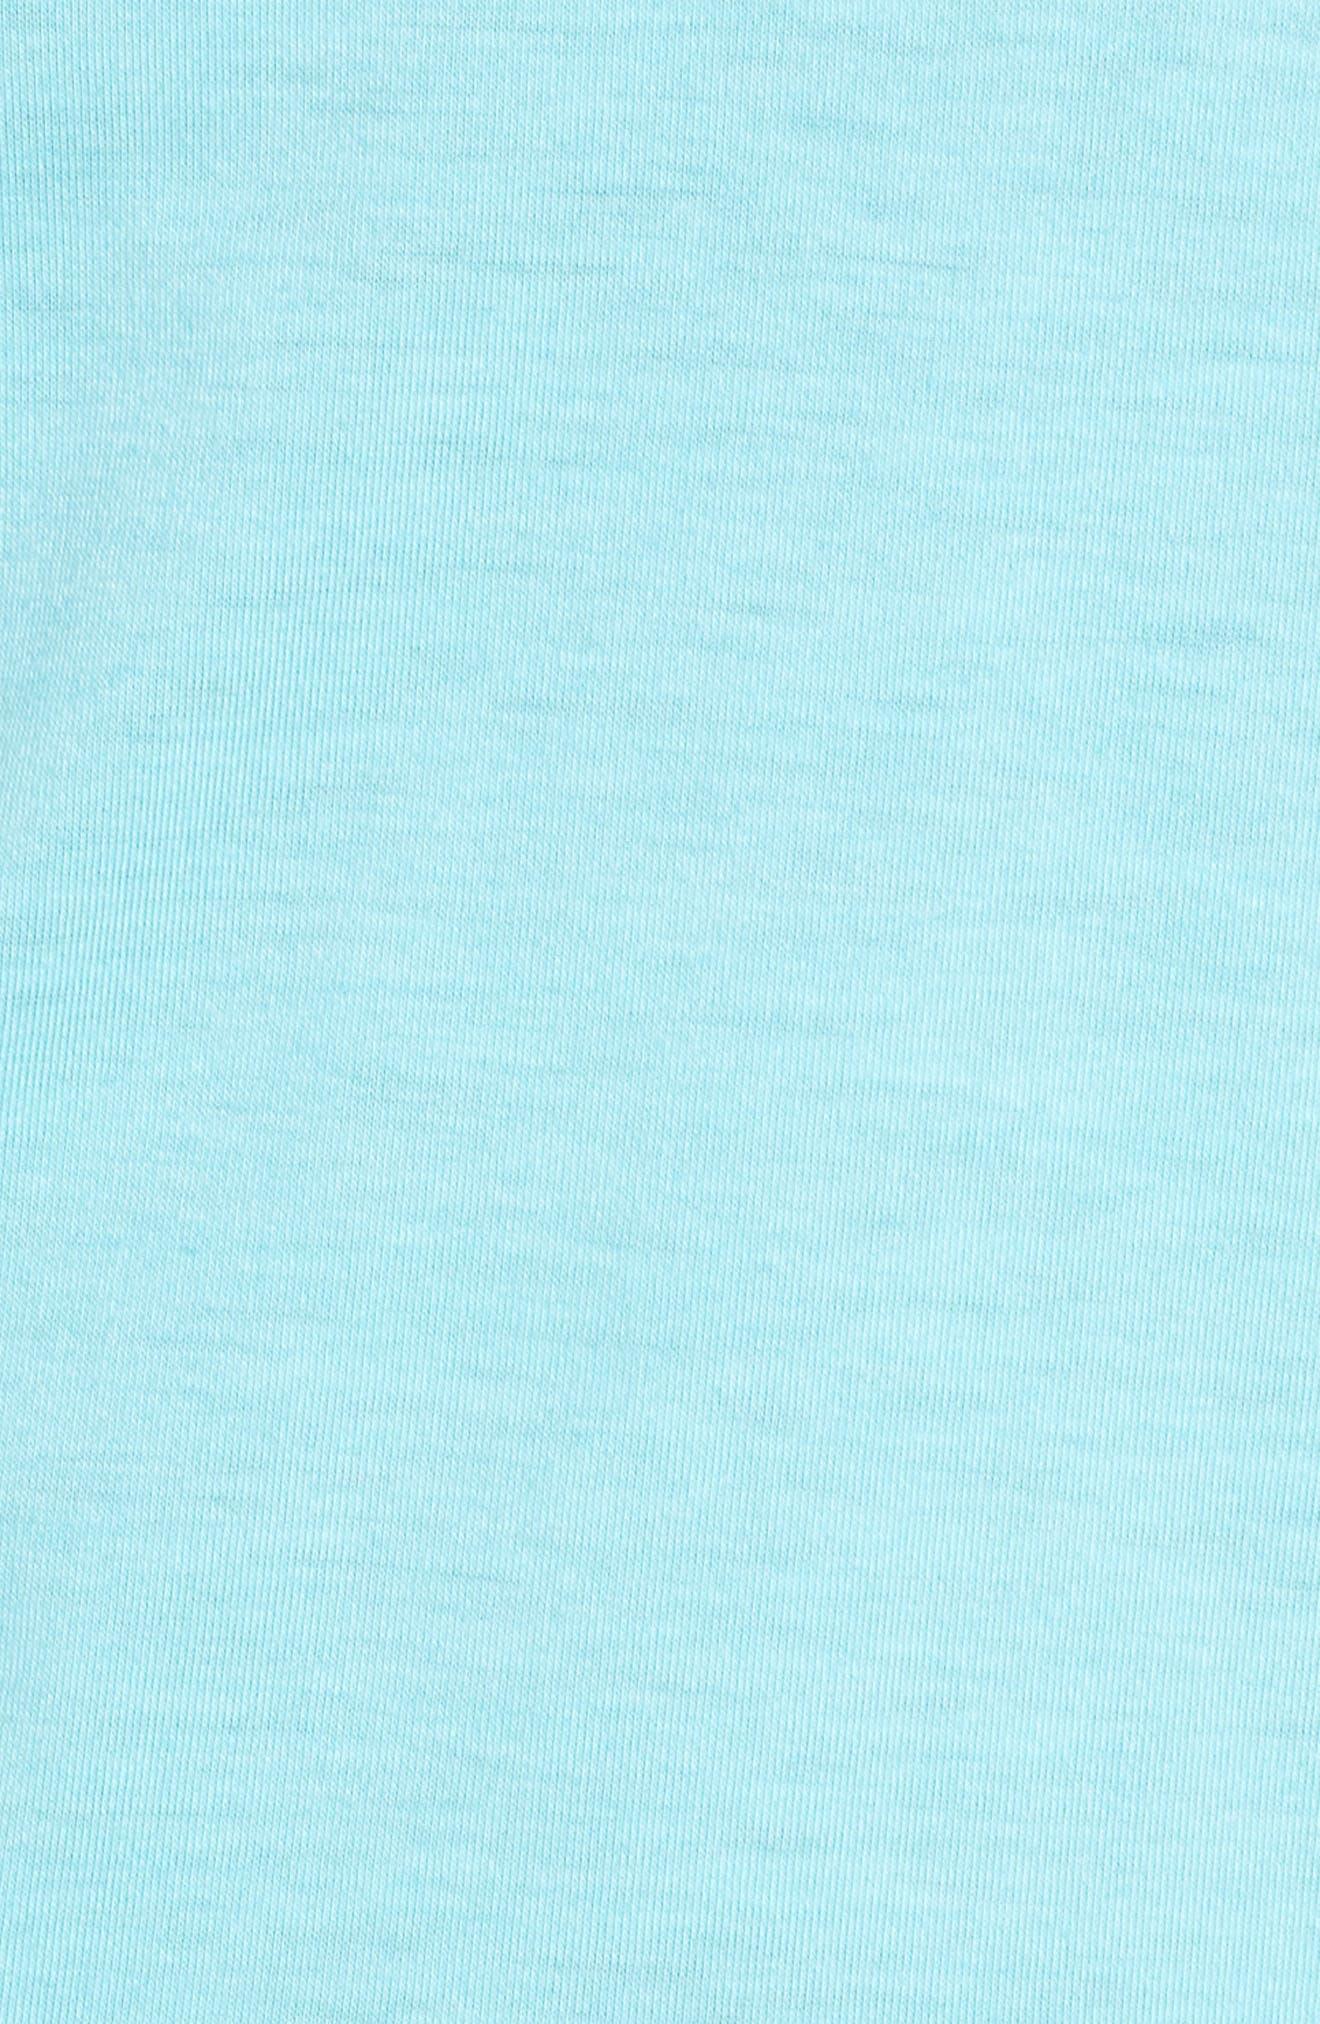 Swyft Funnel Neck Hoodie,                             Alternate thumbnail 6, color,                             VENETIAN BLUE/ REFLECTIVE